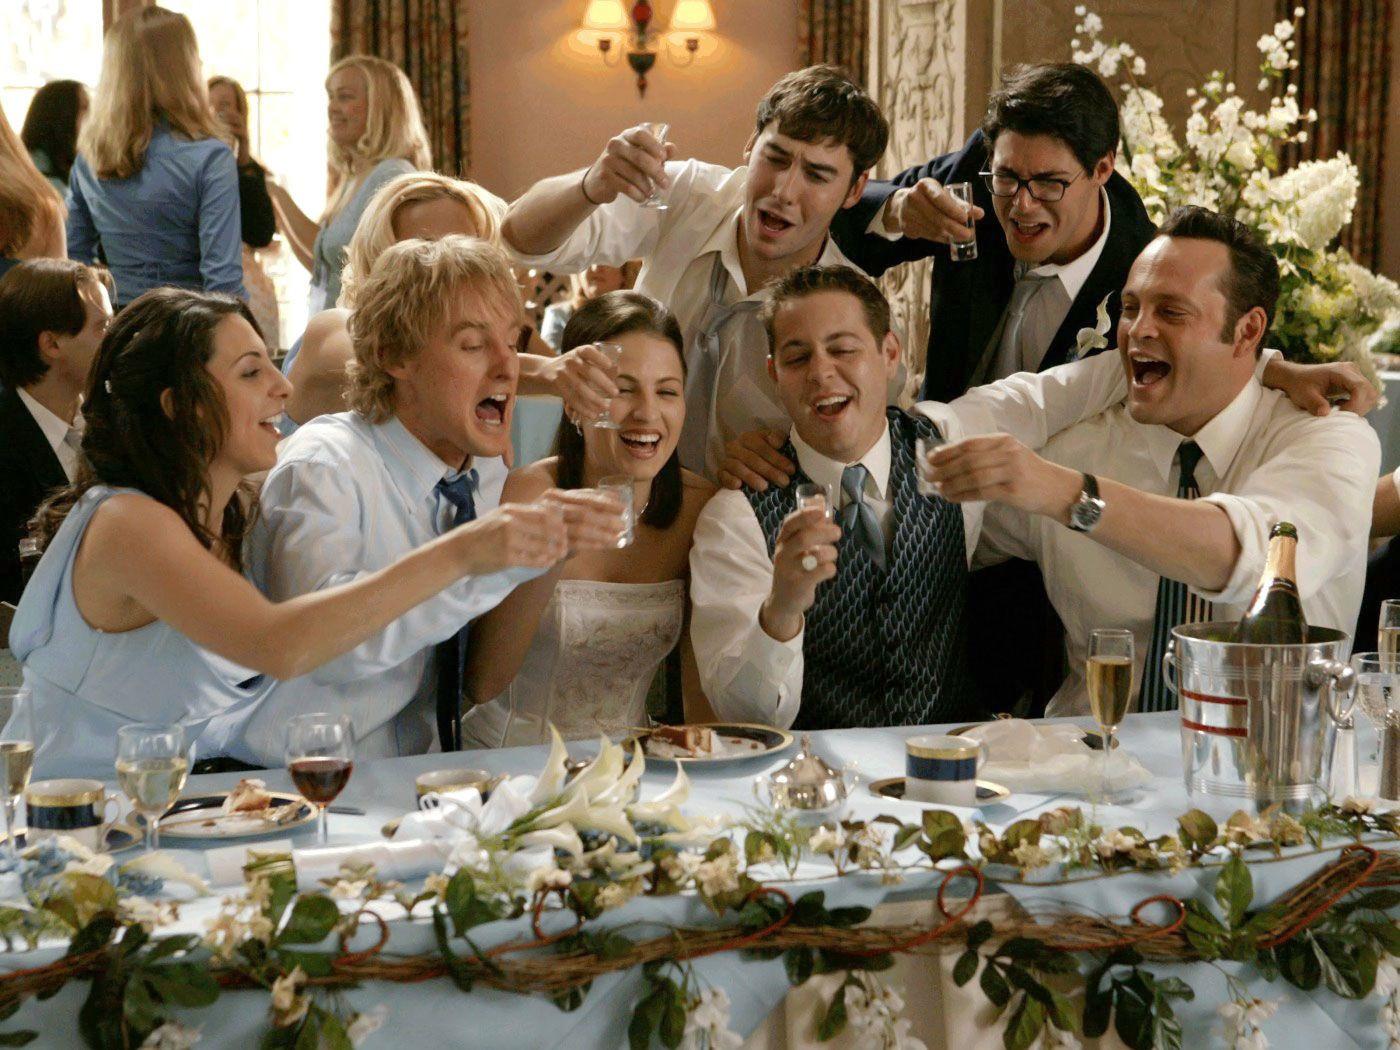 Rehearsal Dinner Toasts  5 Unfor table Movie Wedding Toasts